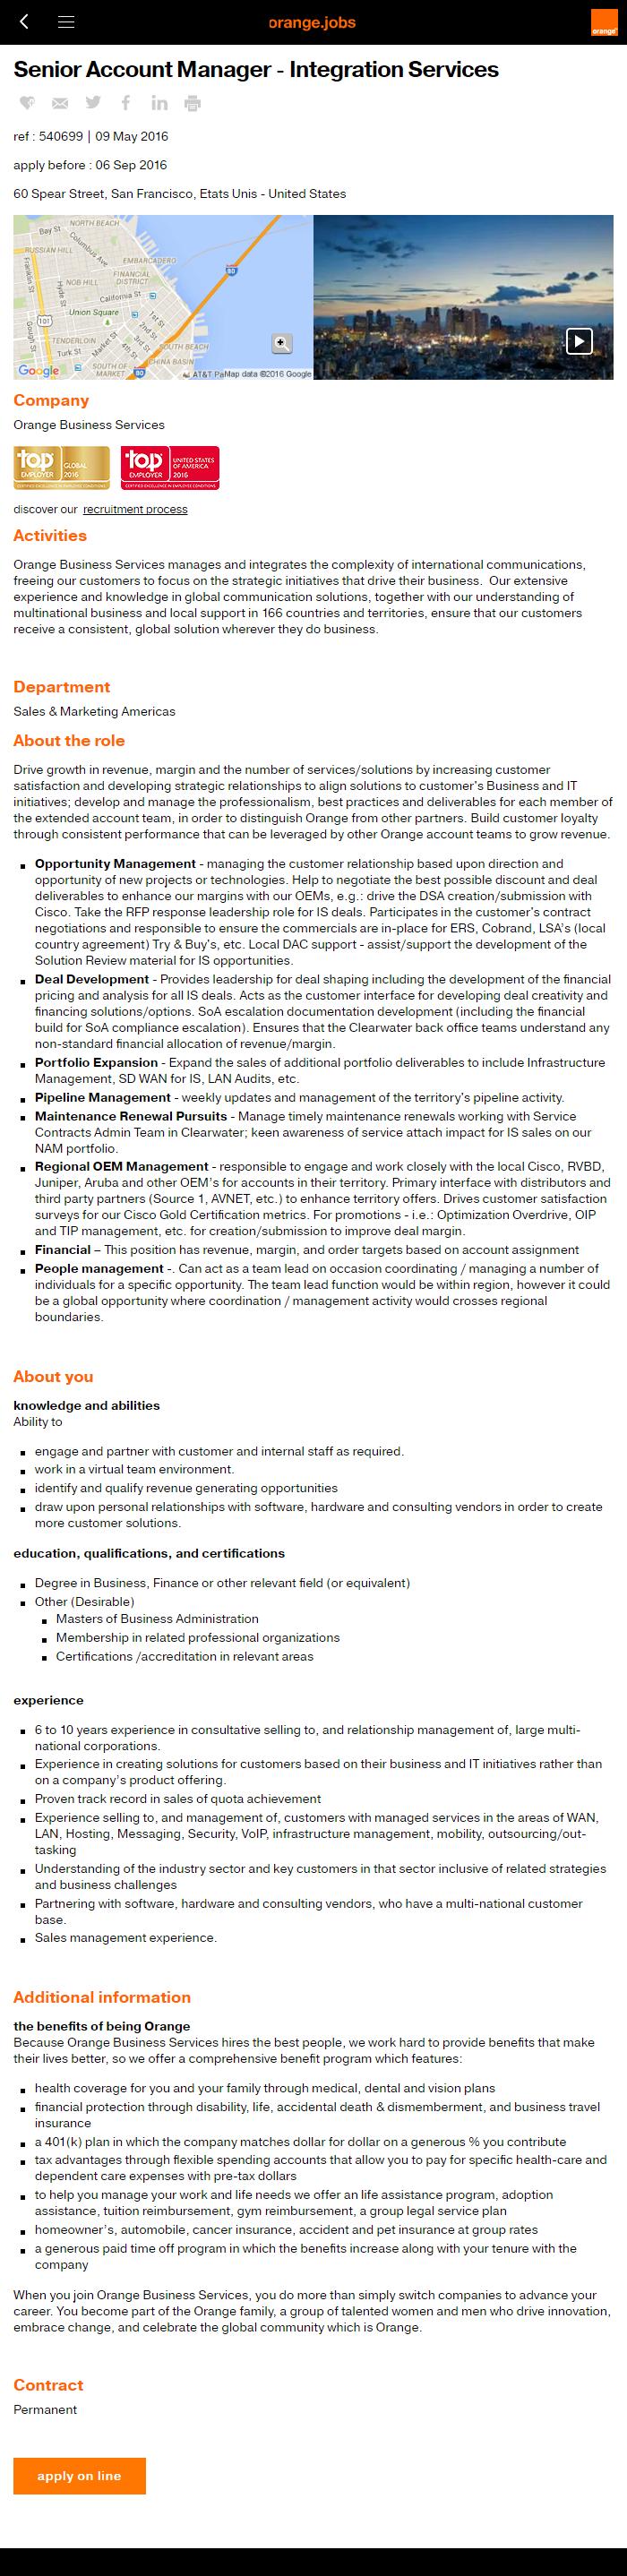 Best Job Descriptions Sample Orange.jobs - Ongig